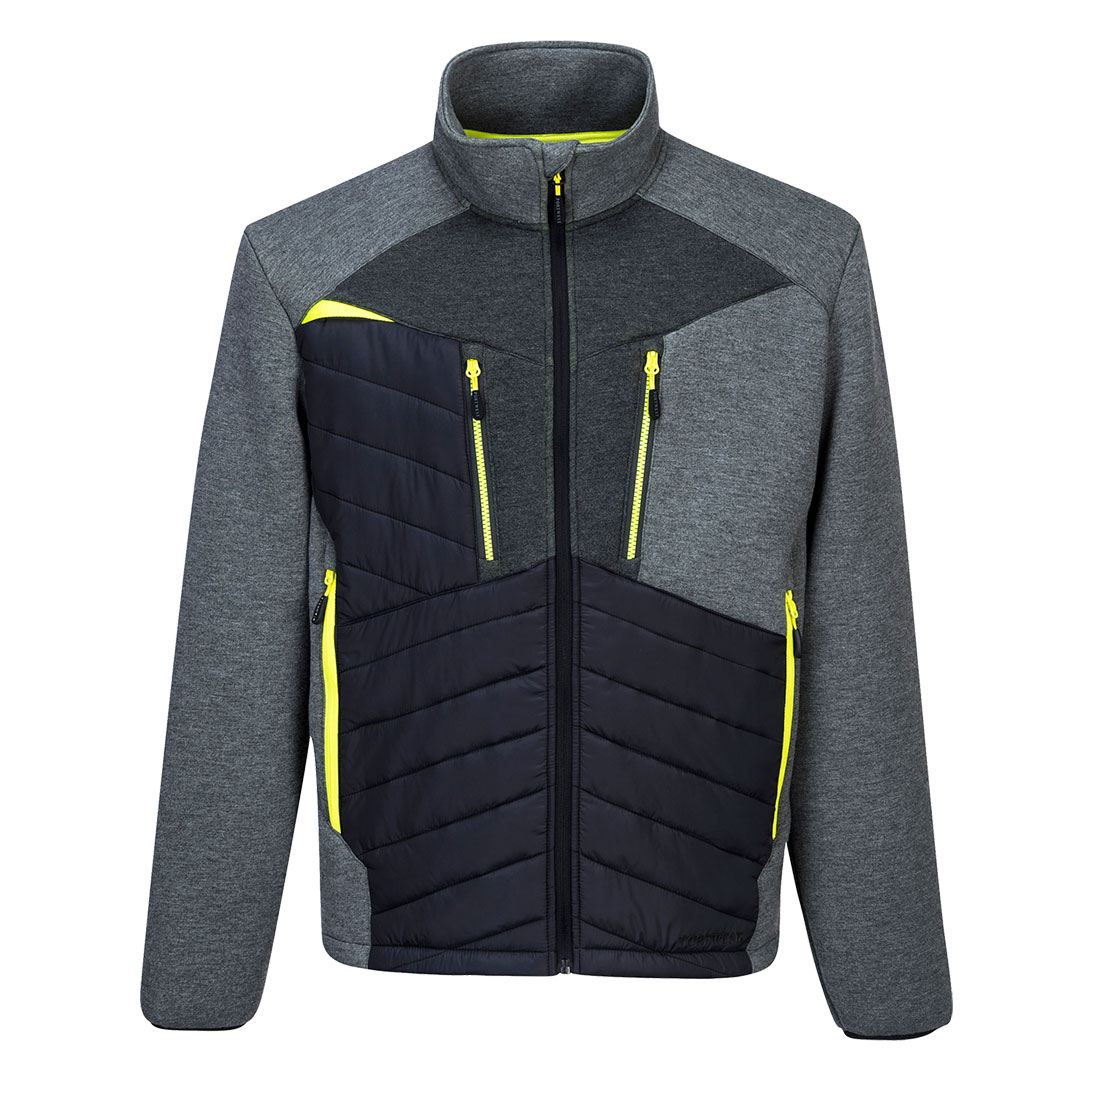 DX4 Jacket